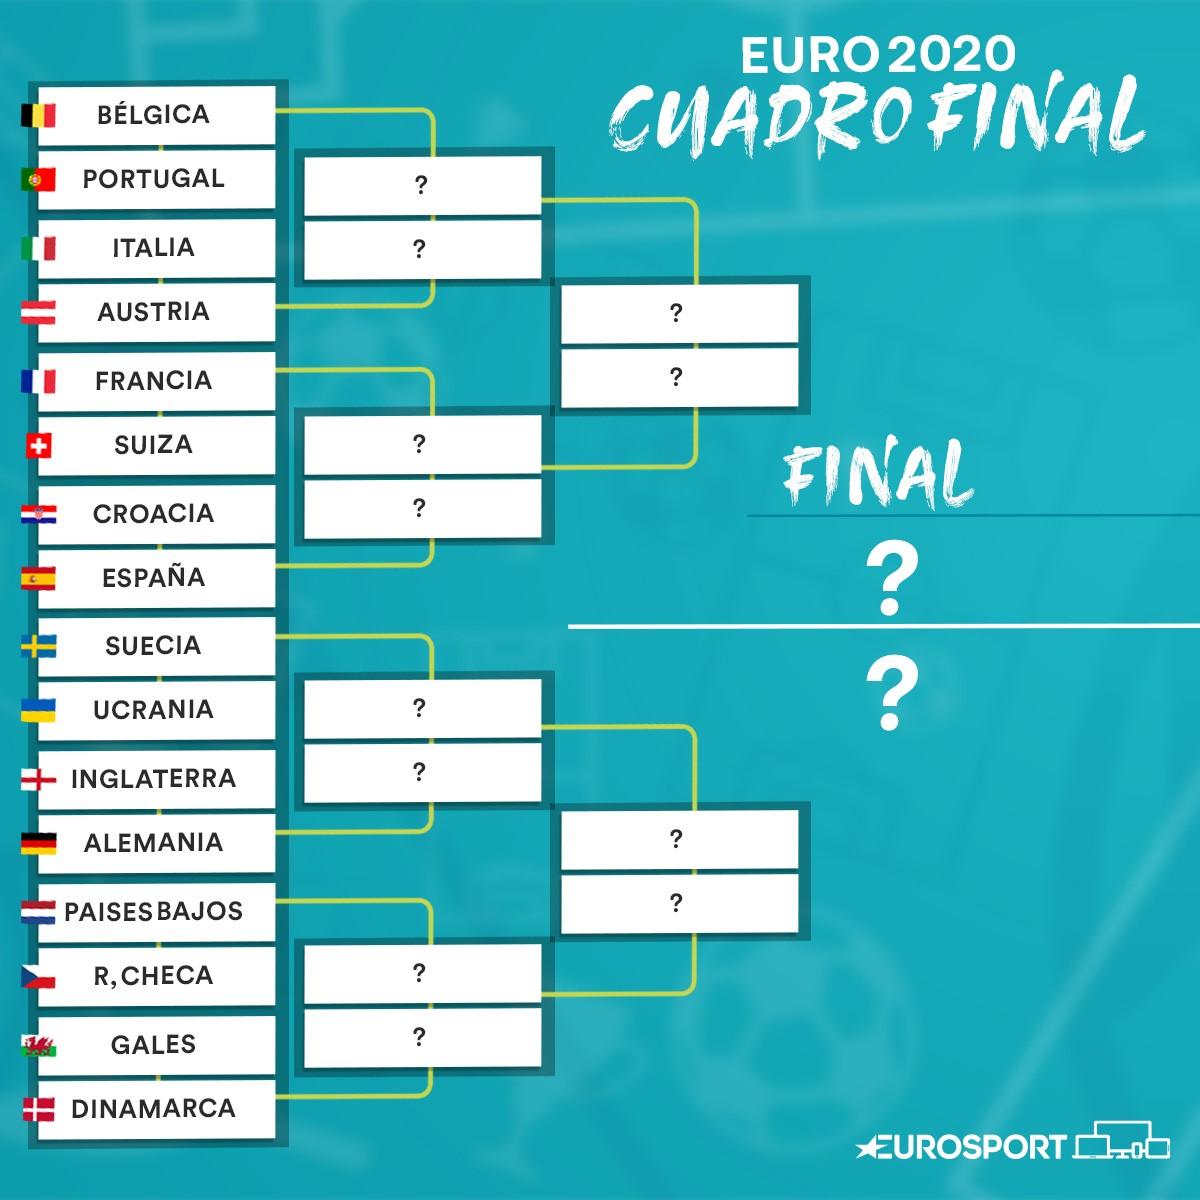 https://i.eurosport.com/2021/06/23/3159764.jpg